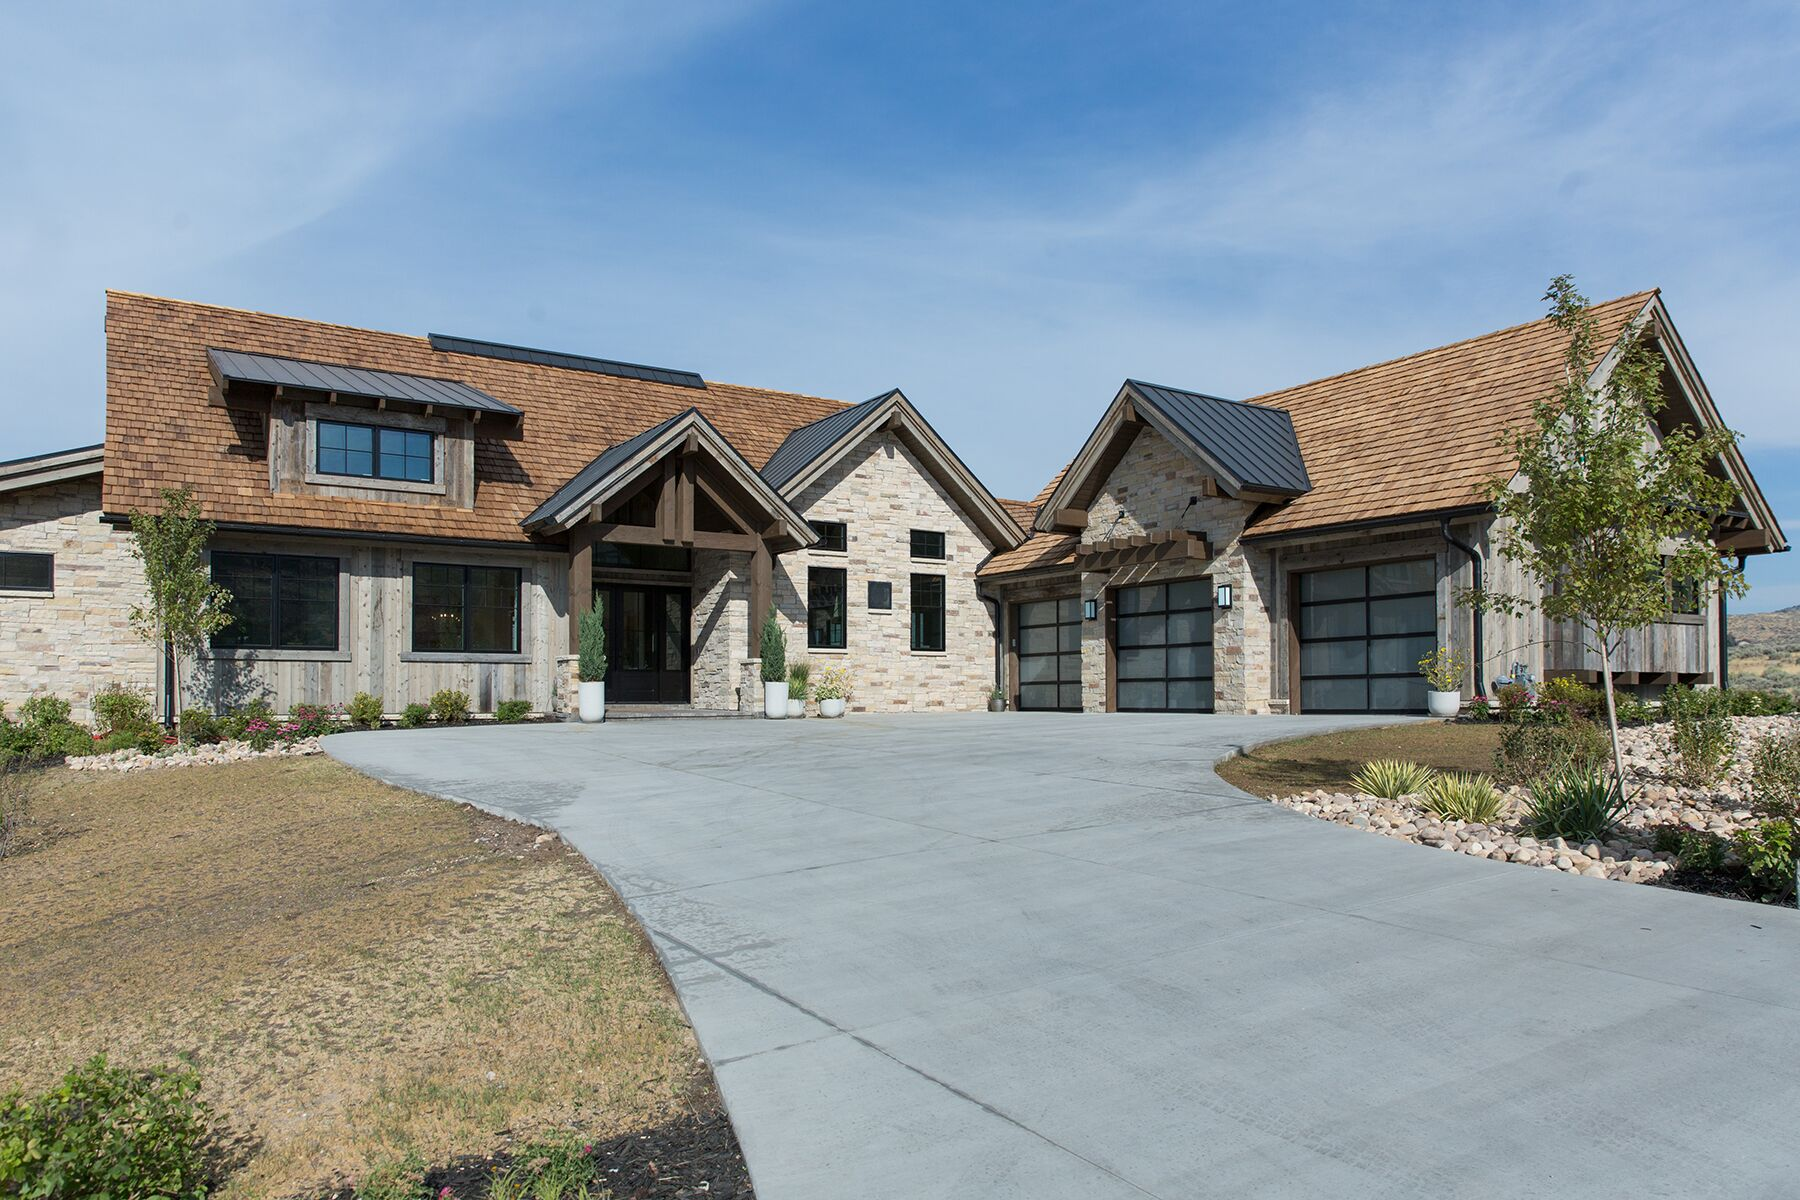 Mountain home exterior in Park City, Utah - Studio McGee Design